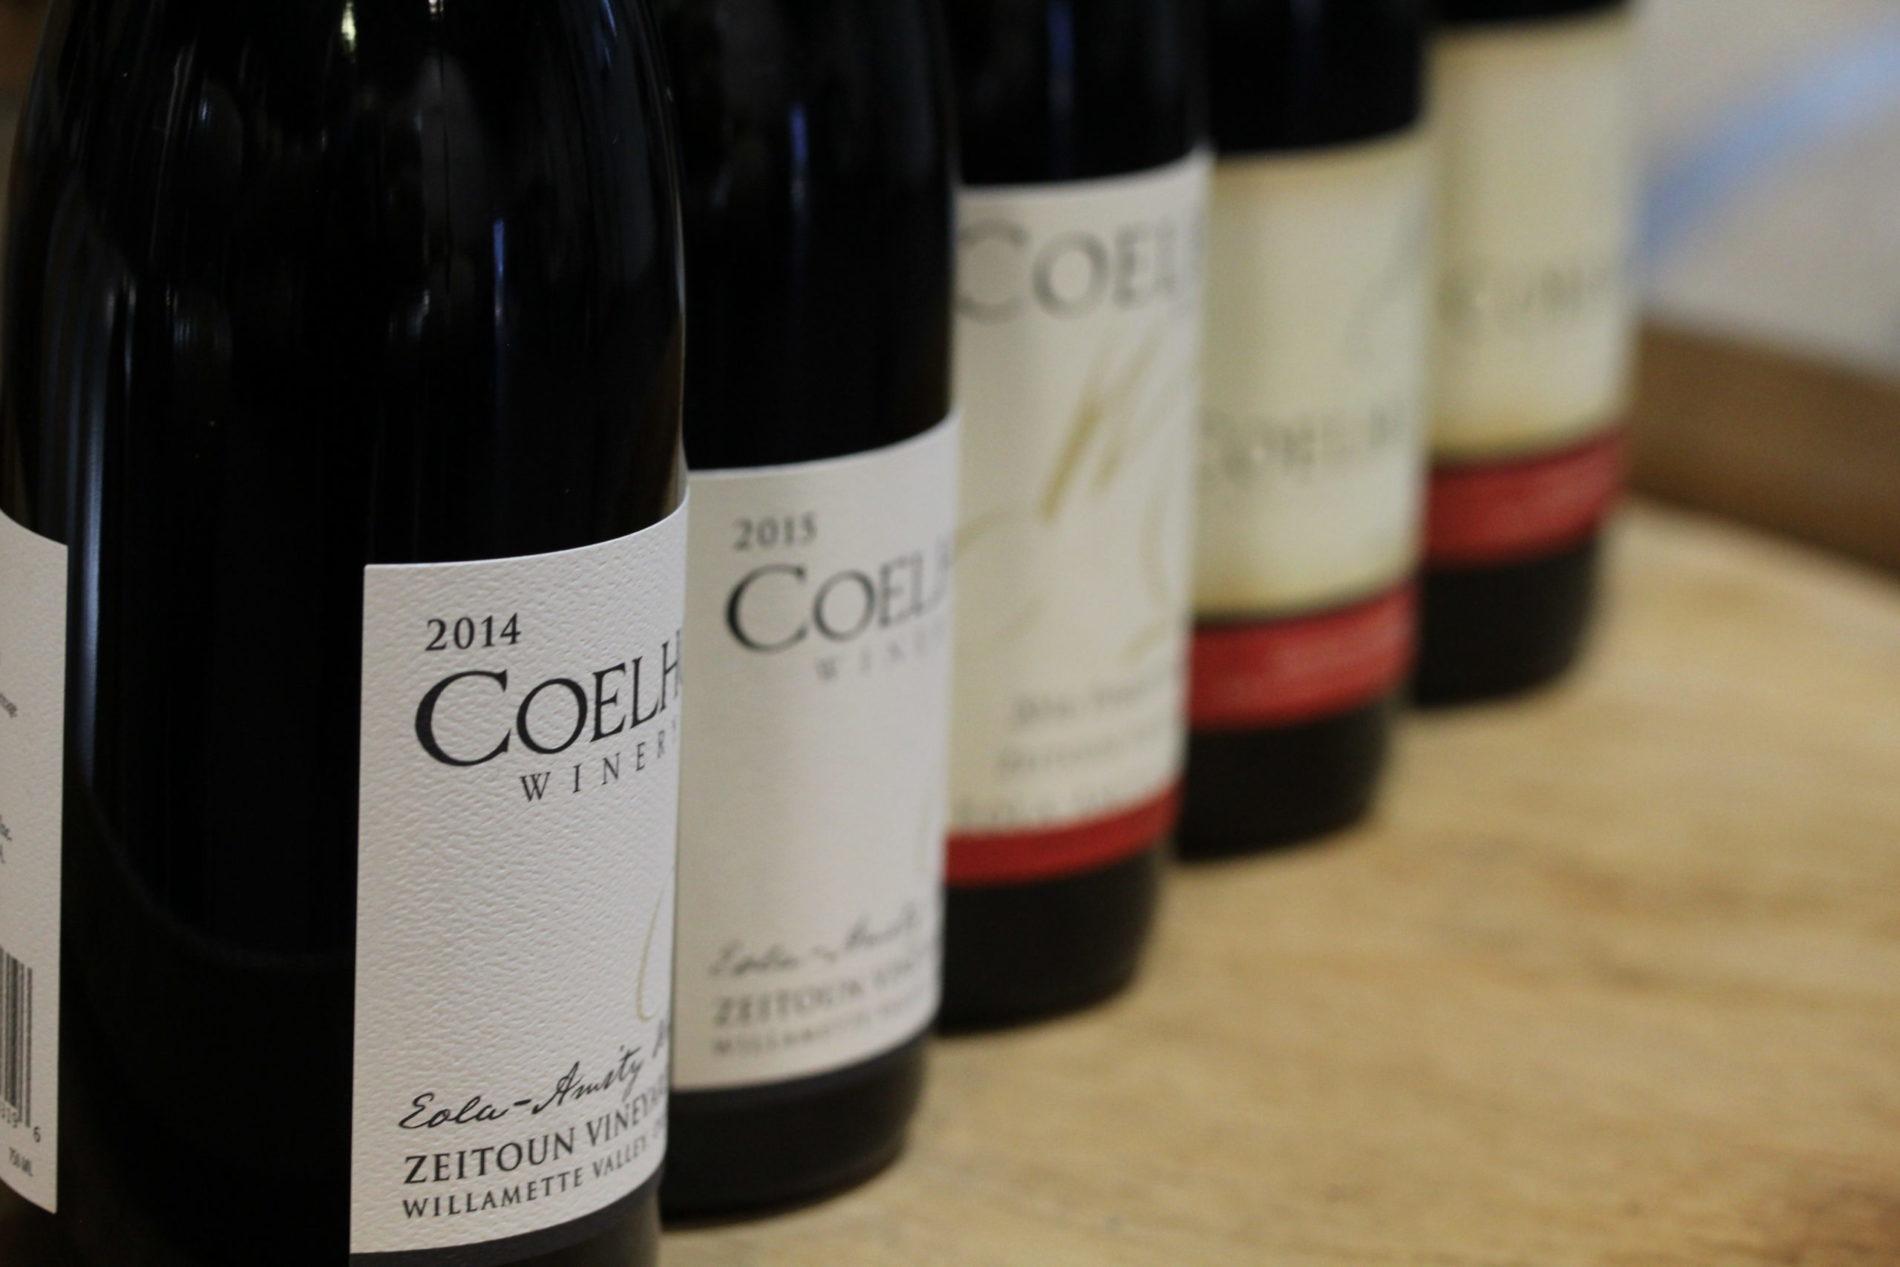 IMG 1356 scaled c6RWFG.tmp  - November Special Tasting: Zeitoun Vineyard Retrospective